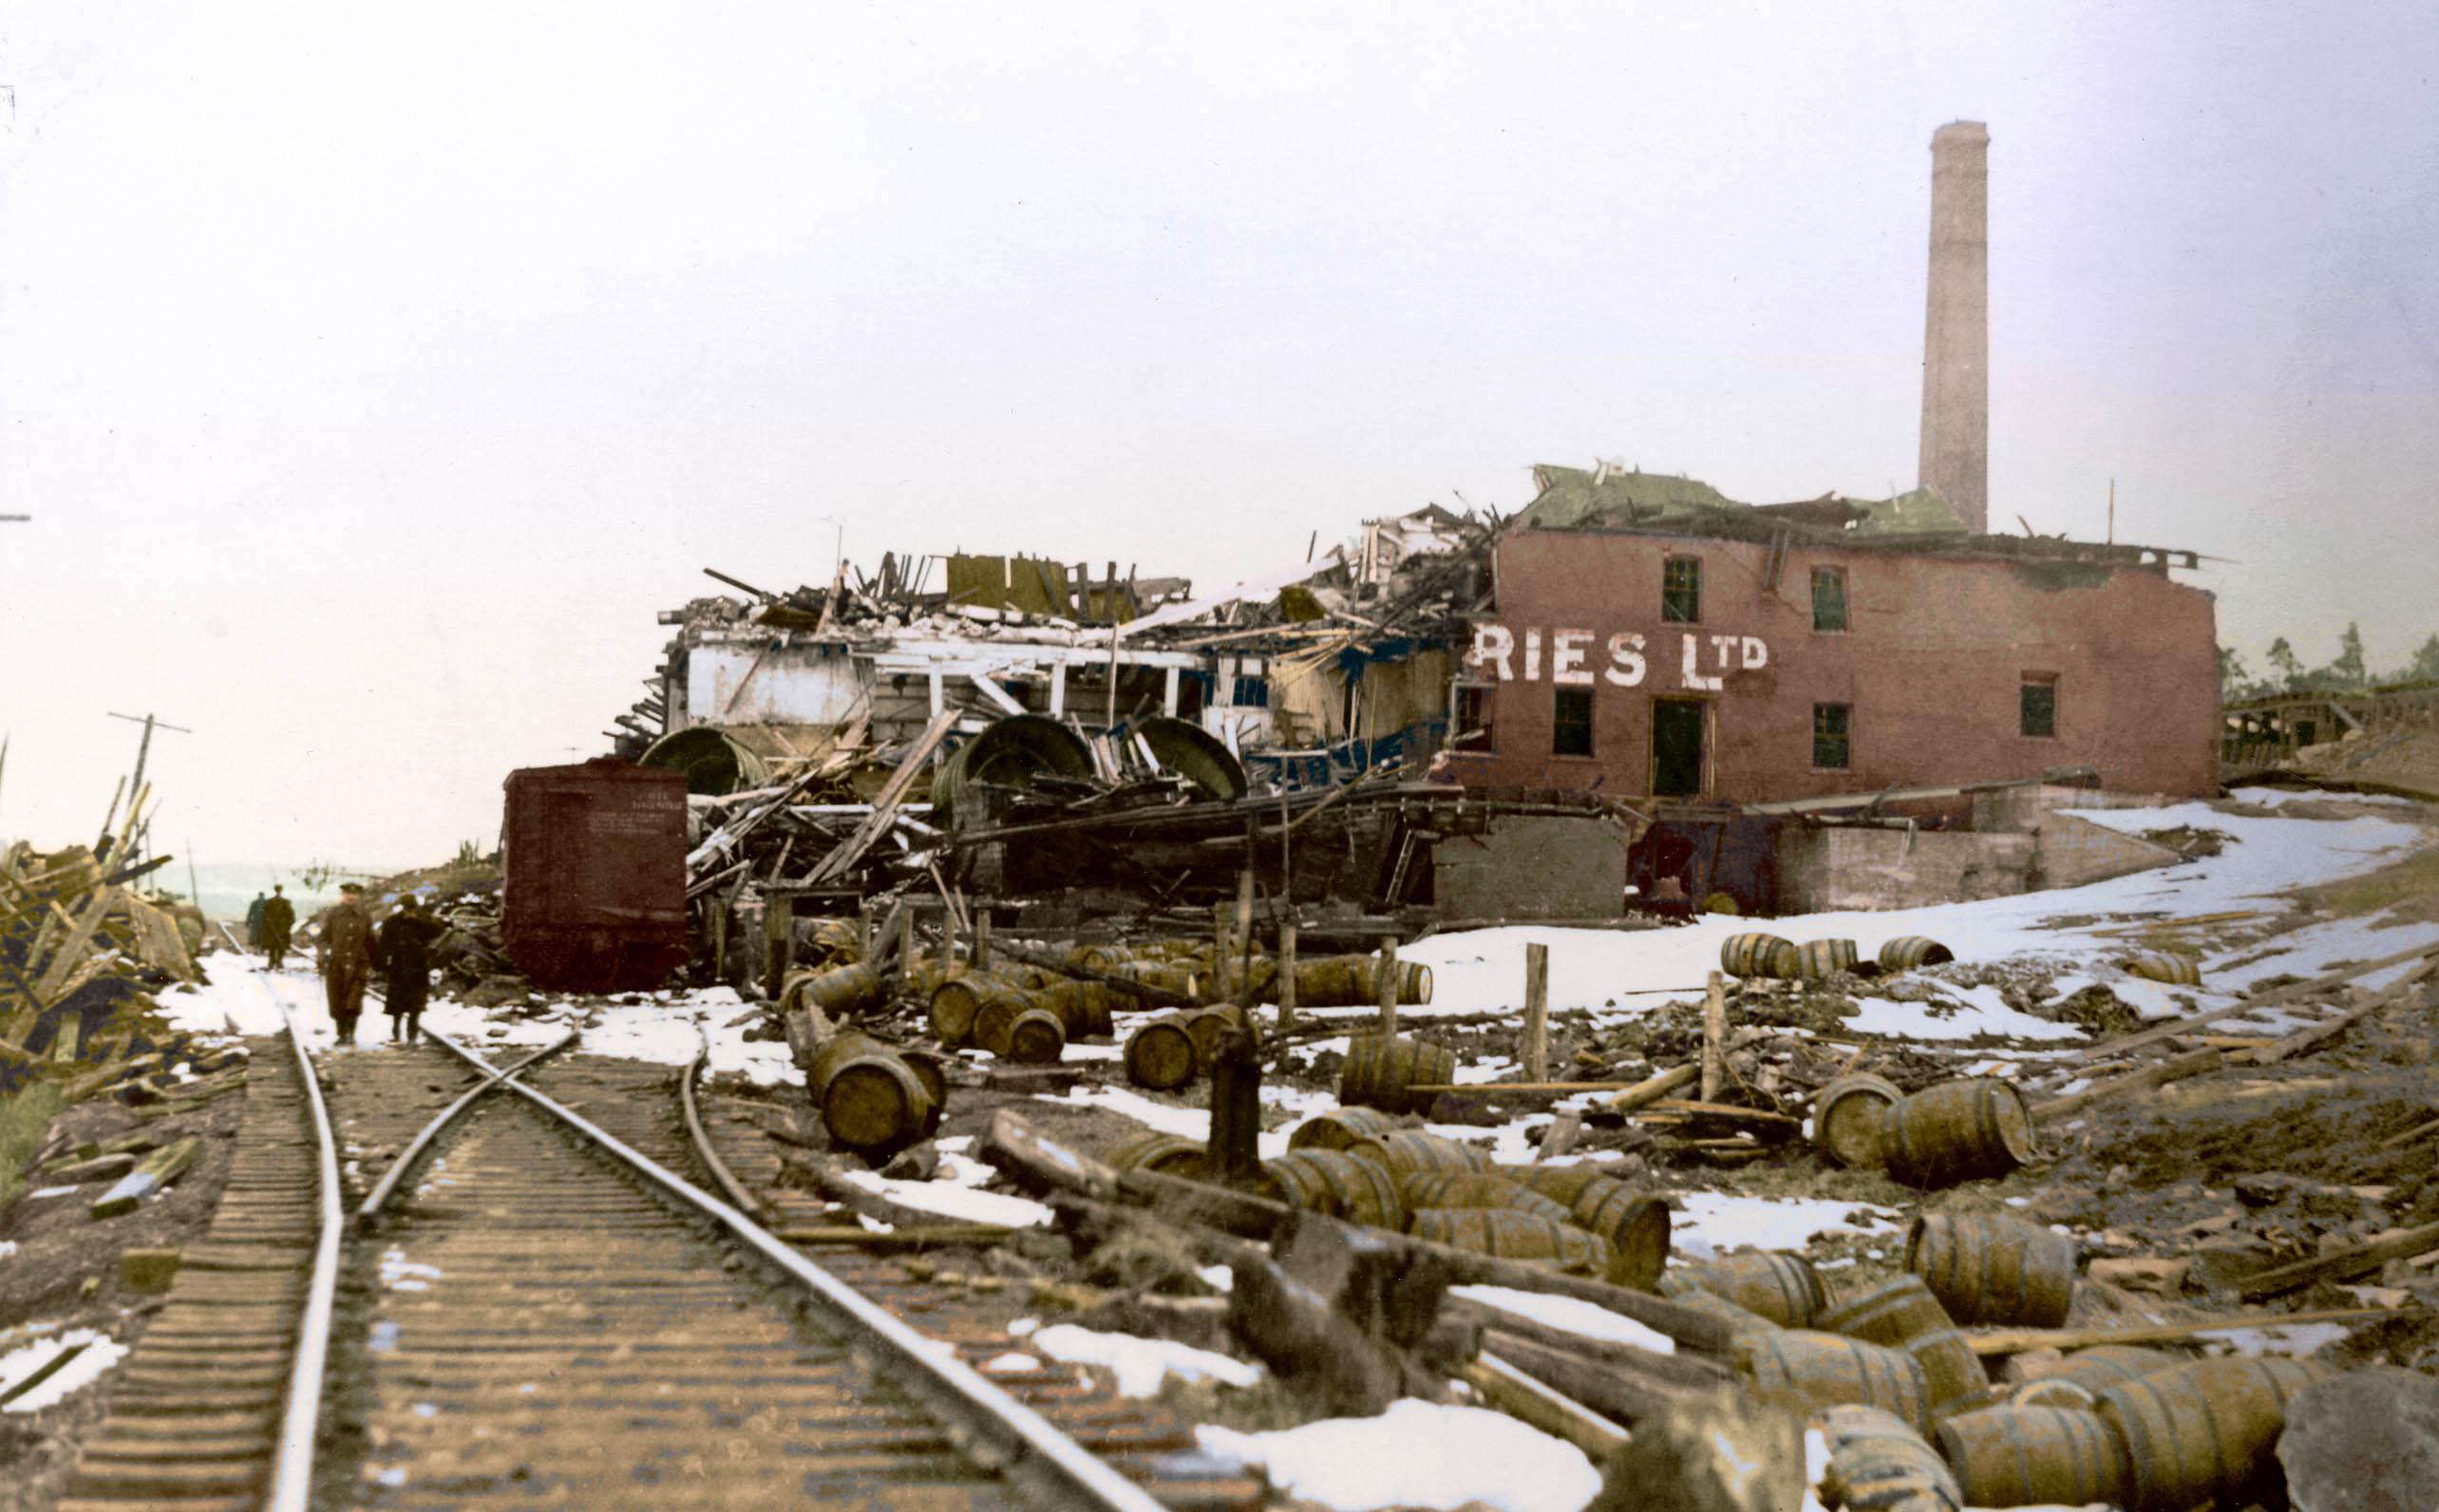 L'Esplosione di Halifax